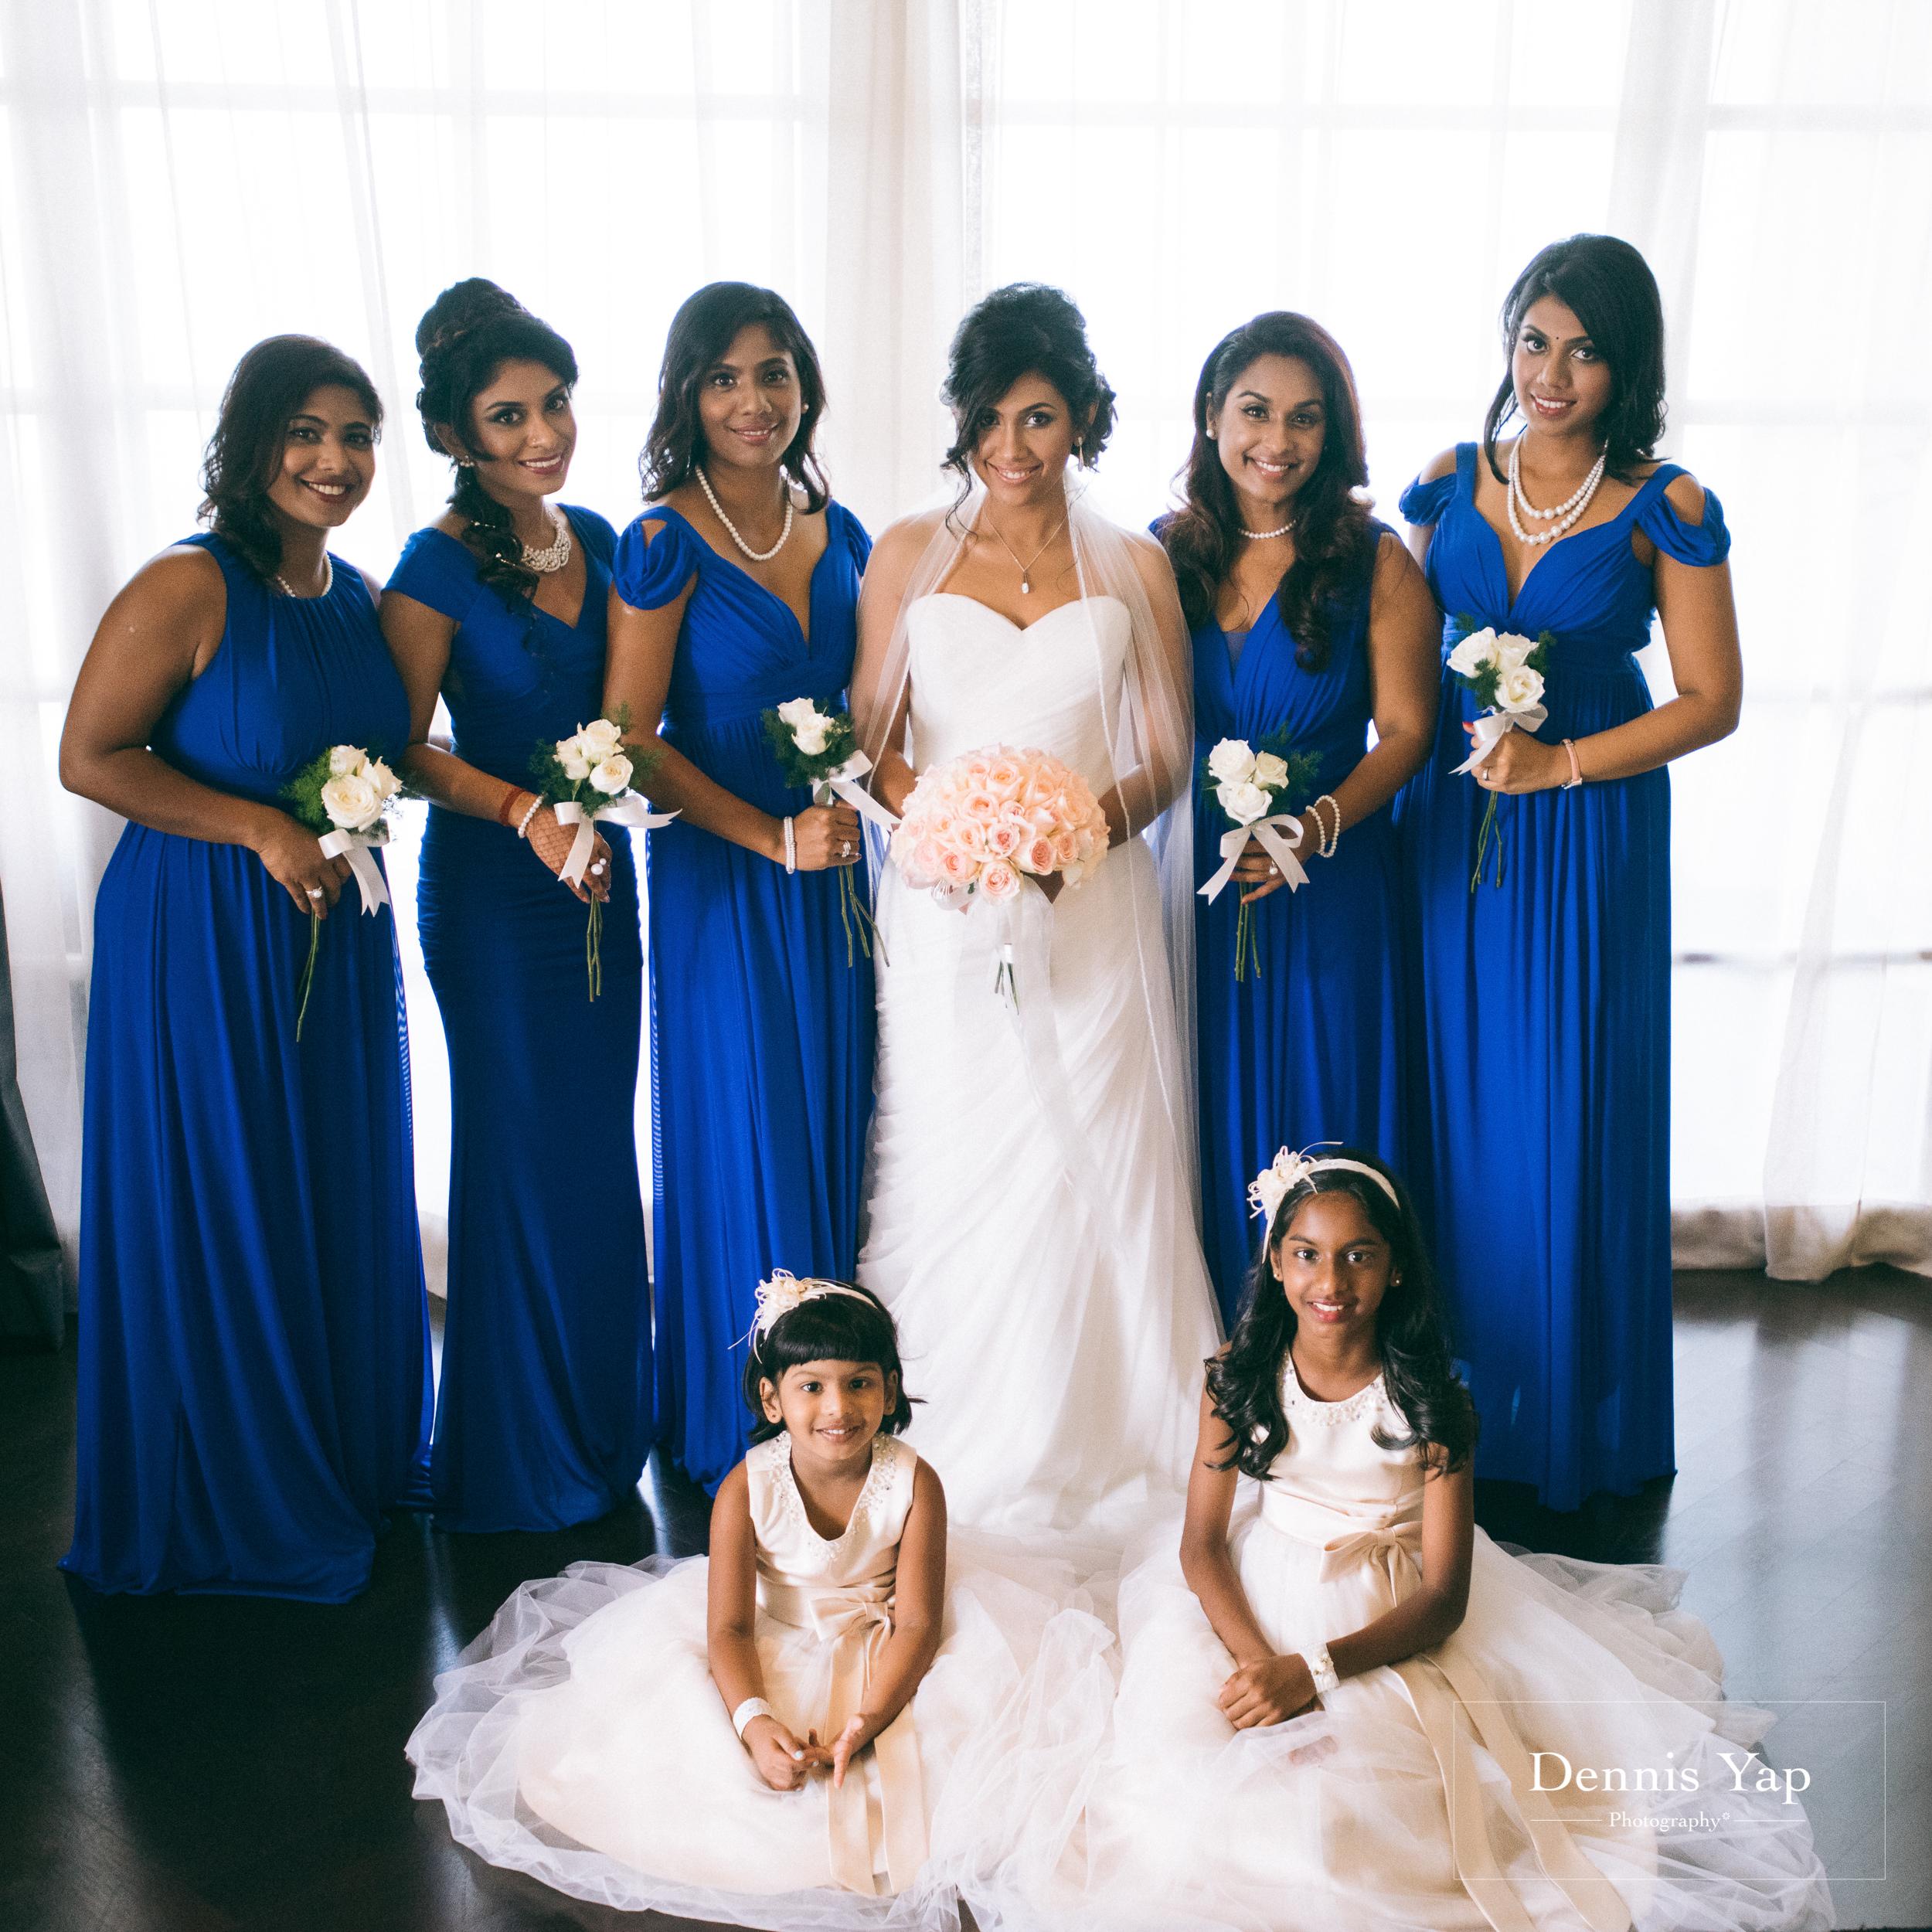 kelvin kosyilya garden wedding penang E and O hotel dennis yap indian wedding photographer-9.jpg